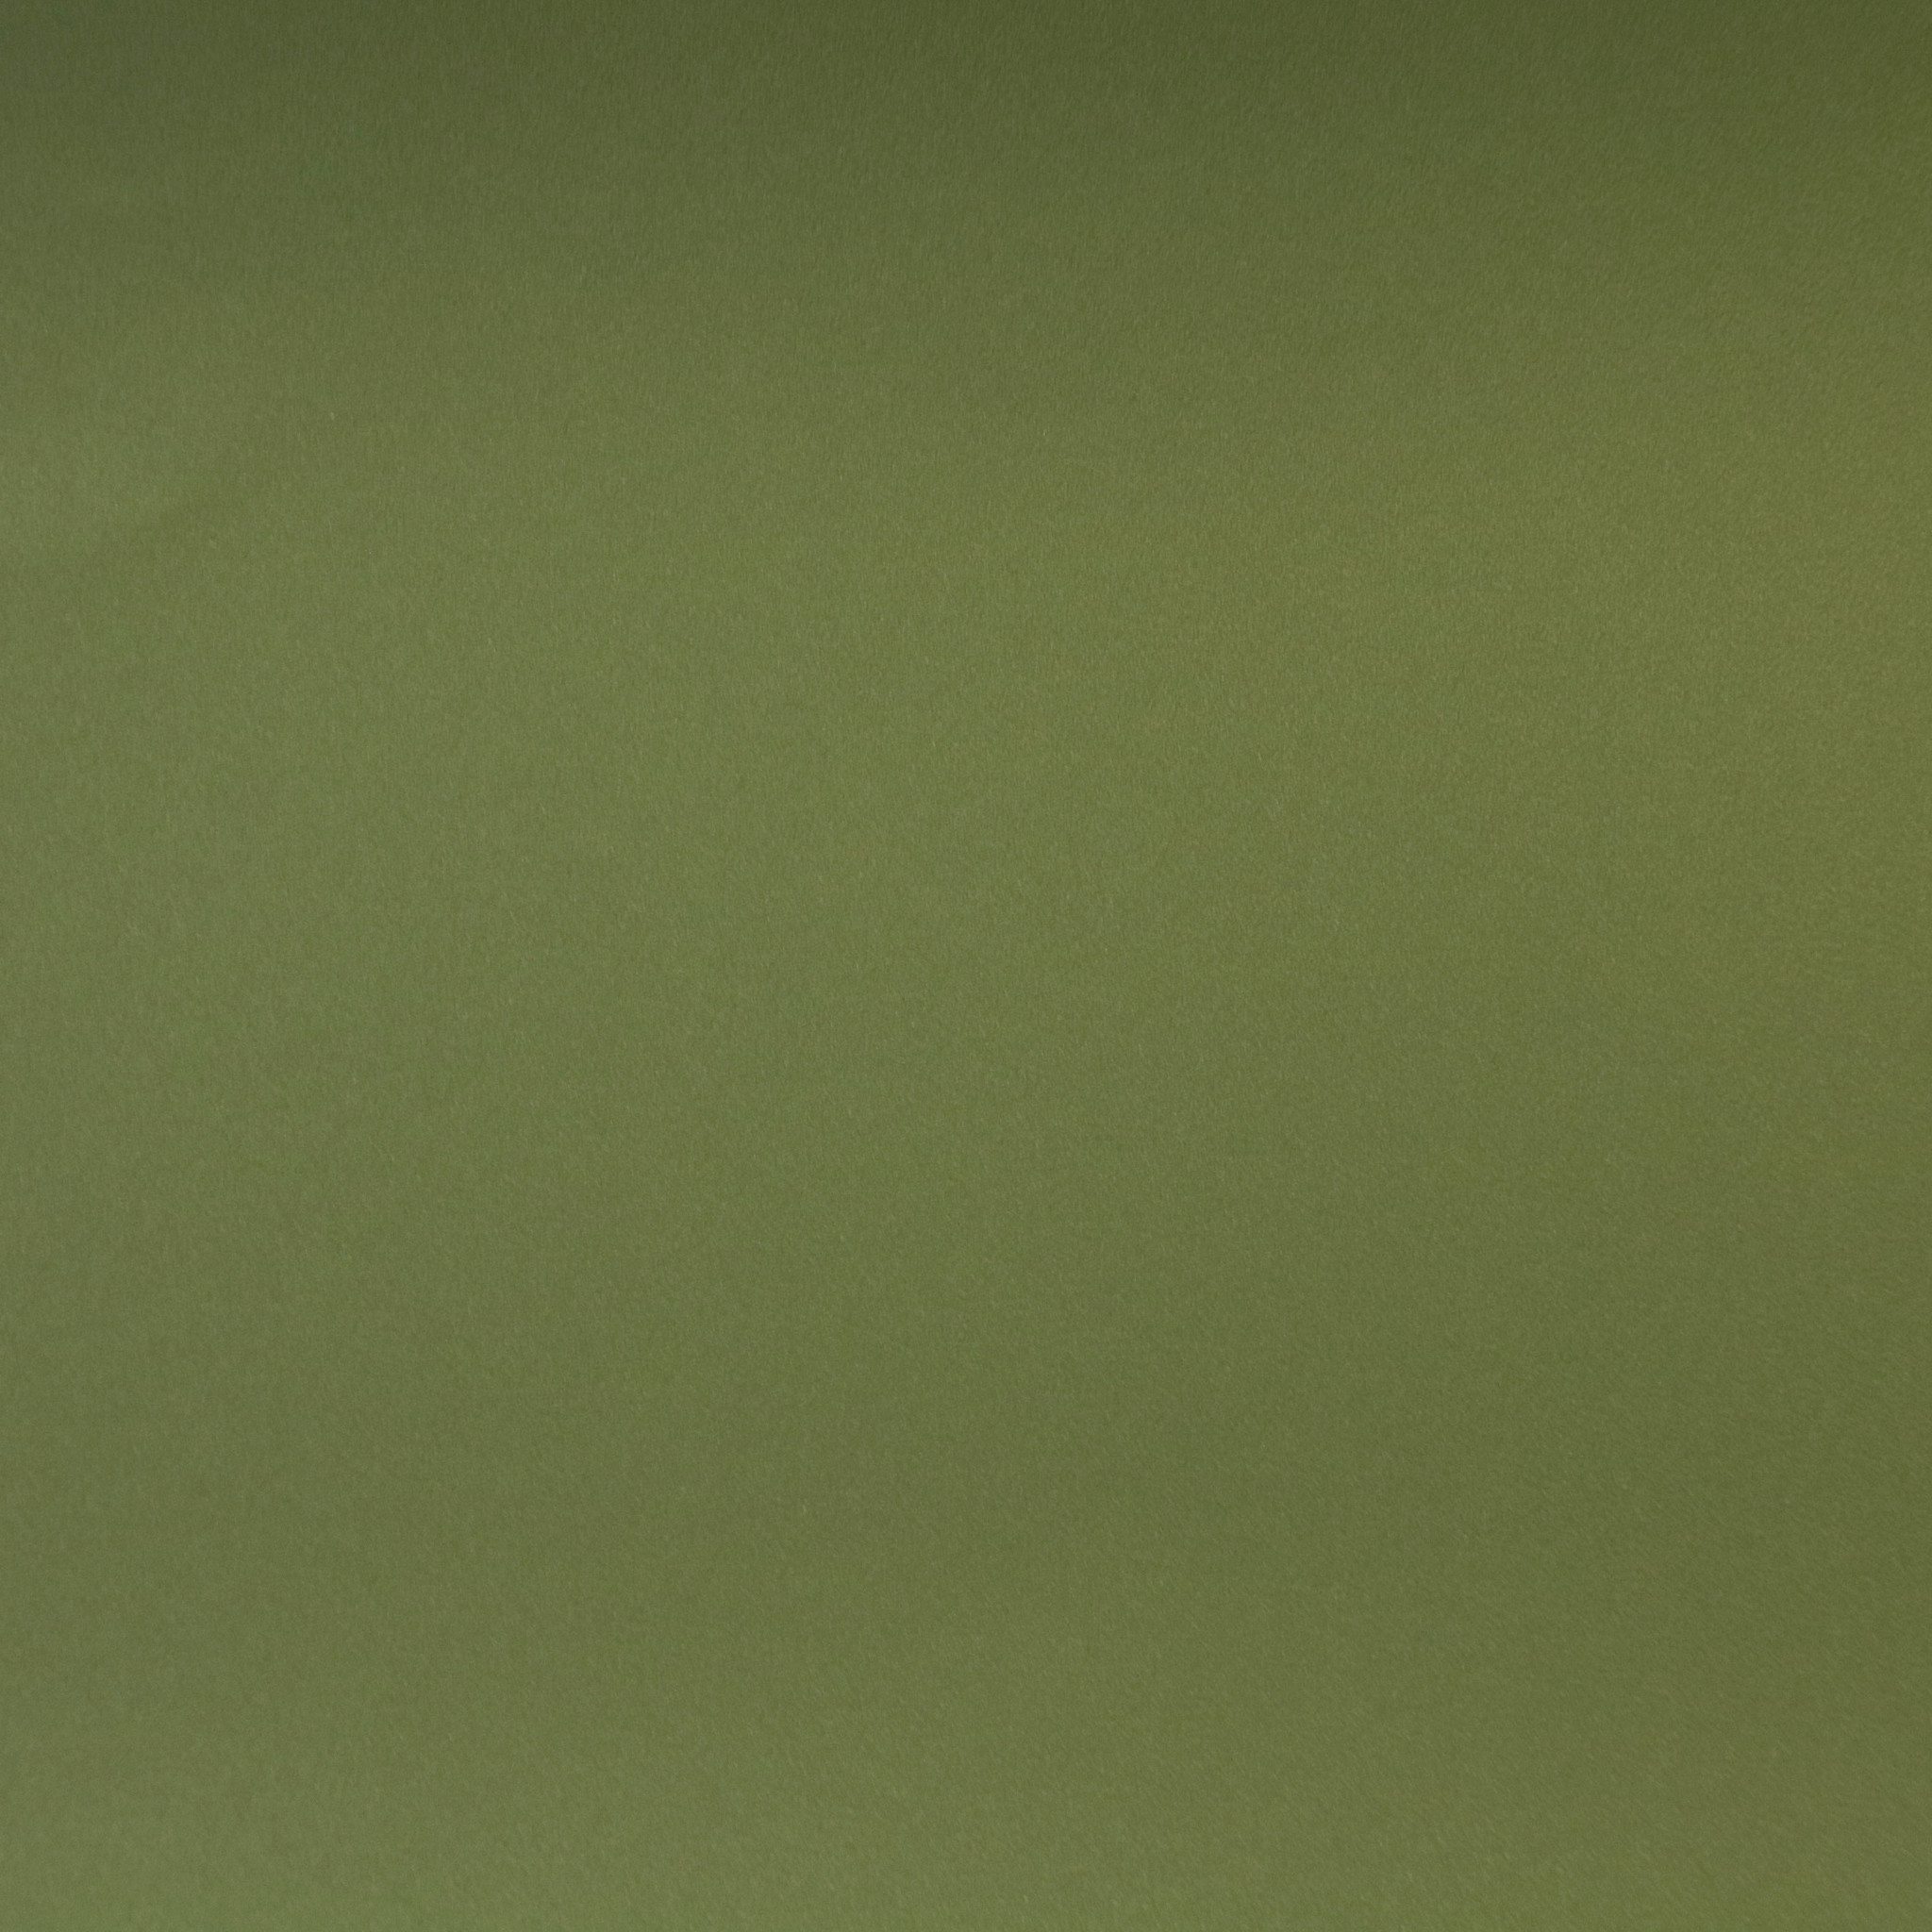 Interieurfolie Military Green